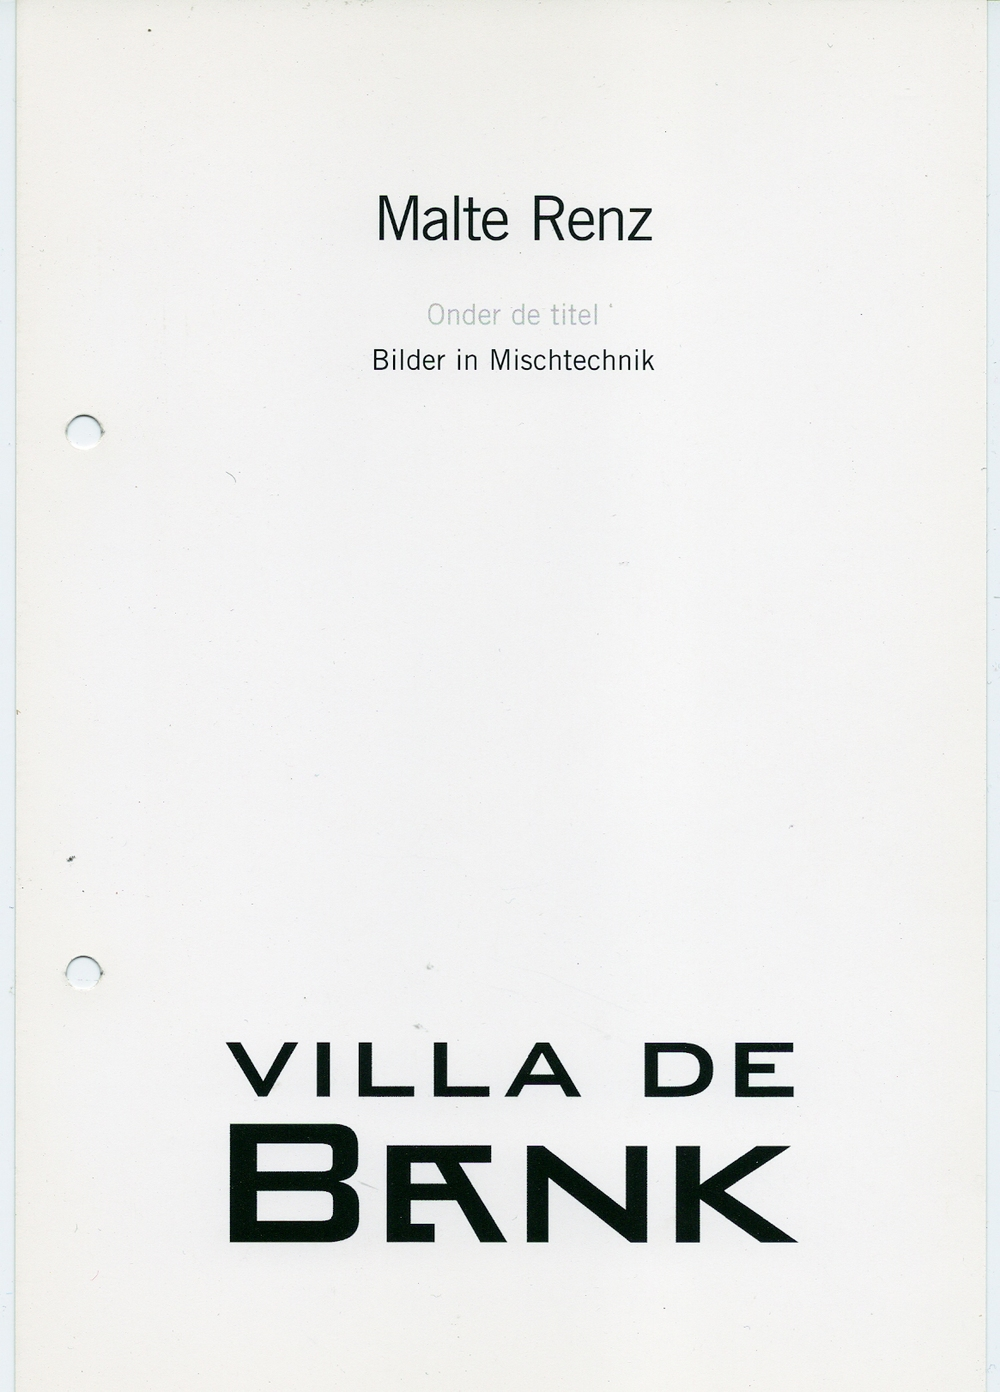 Malte Renz,Bilder in Mischtechnik, 2004